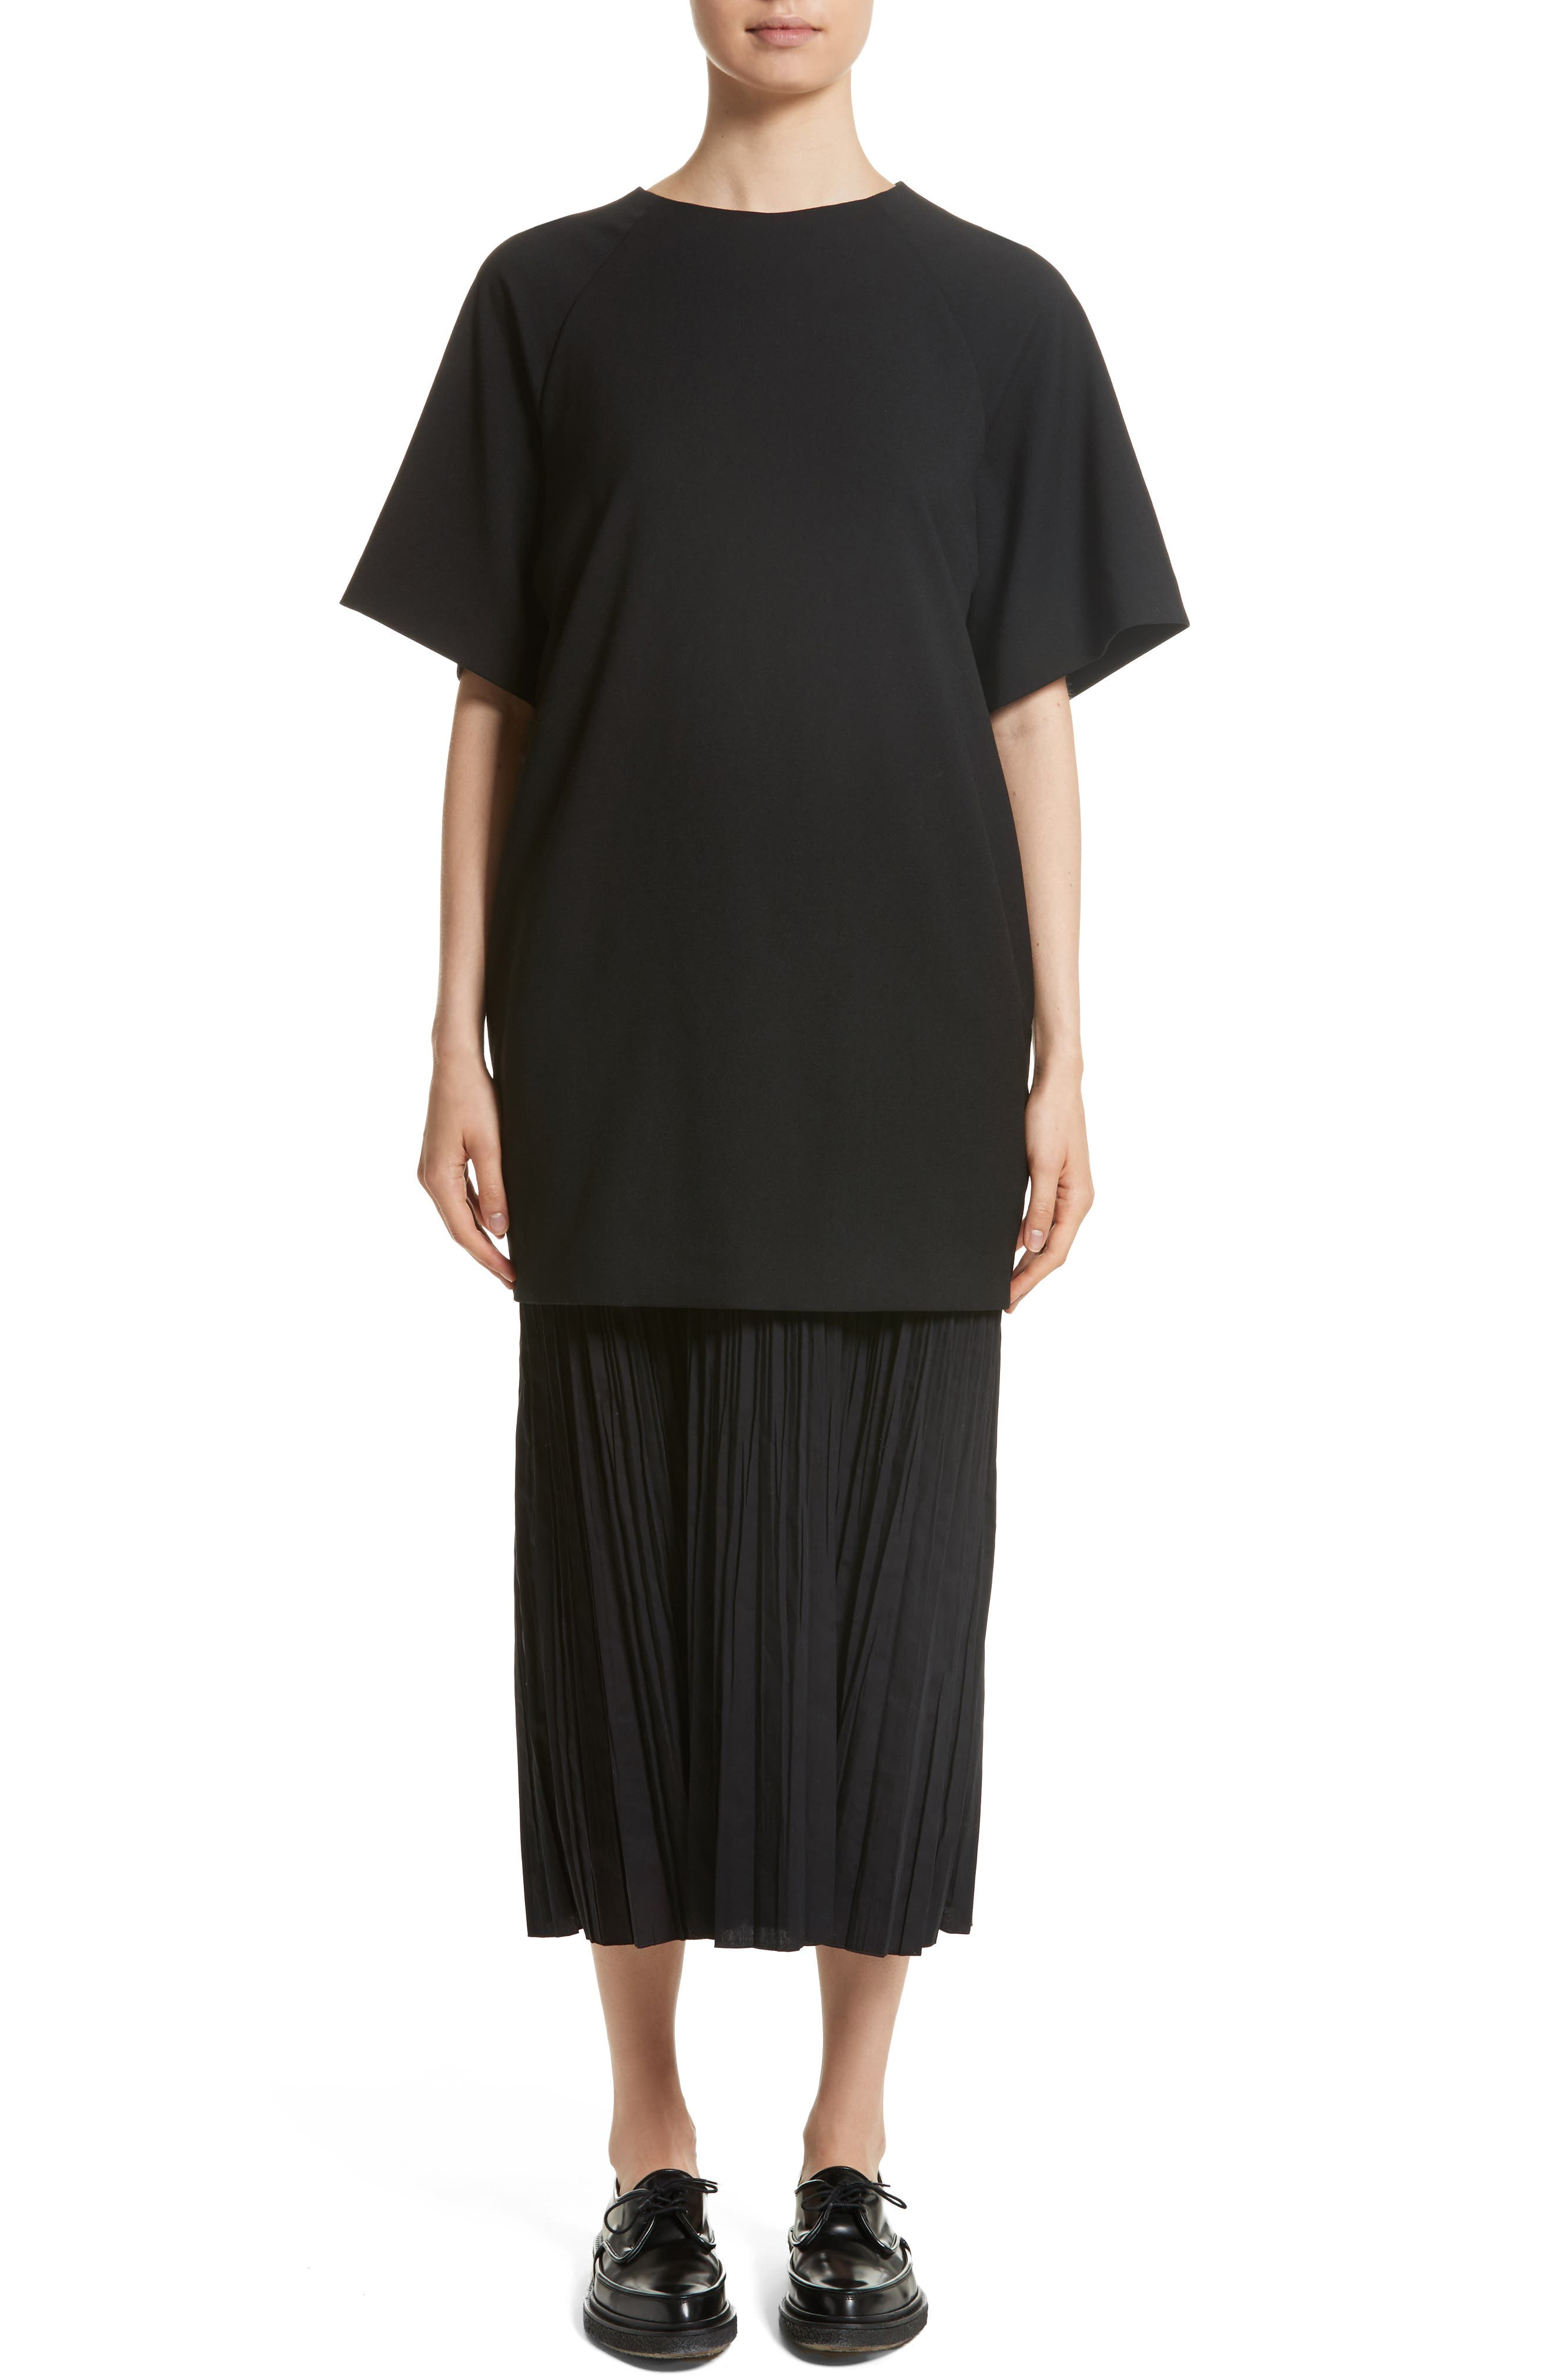 K Bottom Pleated Dress,                             Main thumbnail 1, color,                             Black